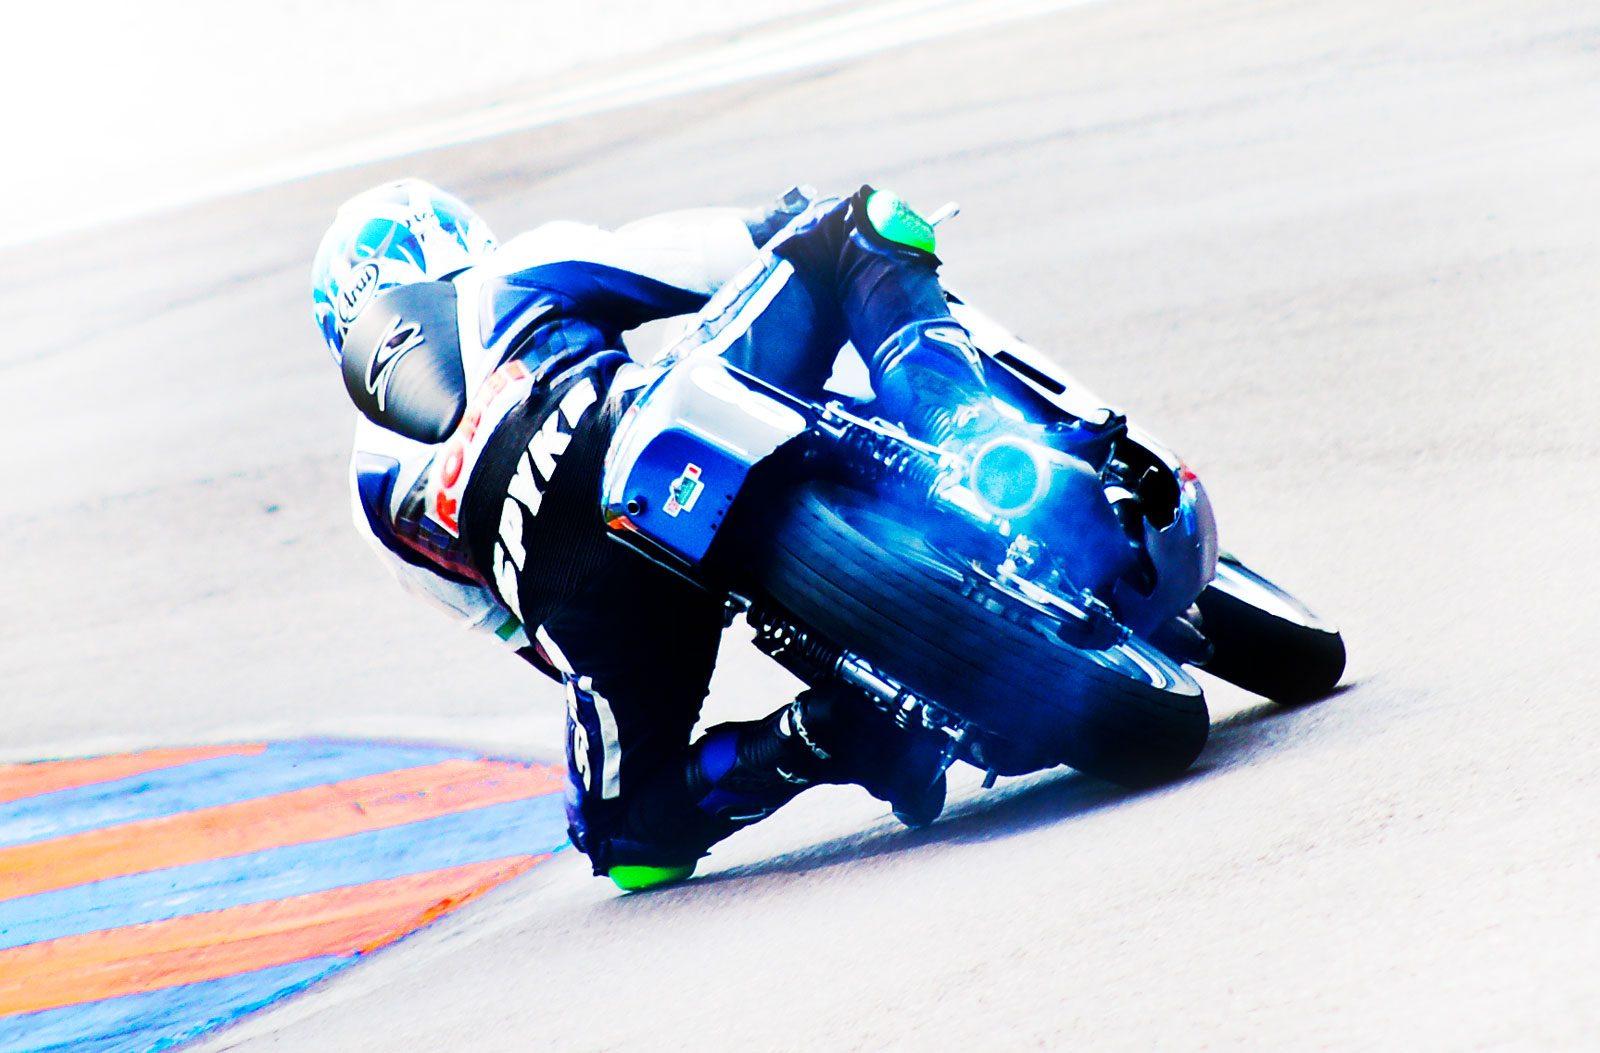 alberto sala writer pictures motorcycles triumph